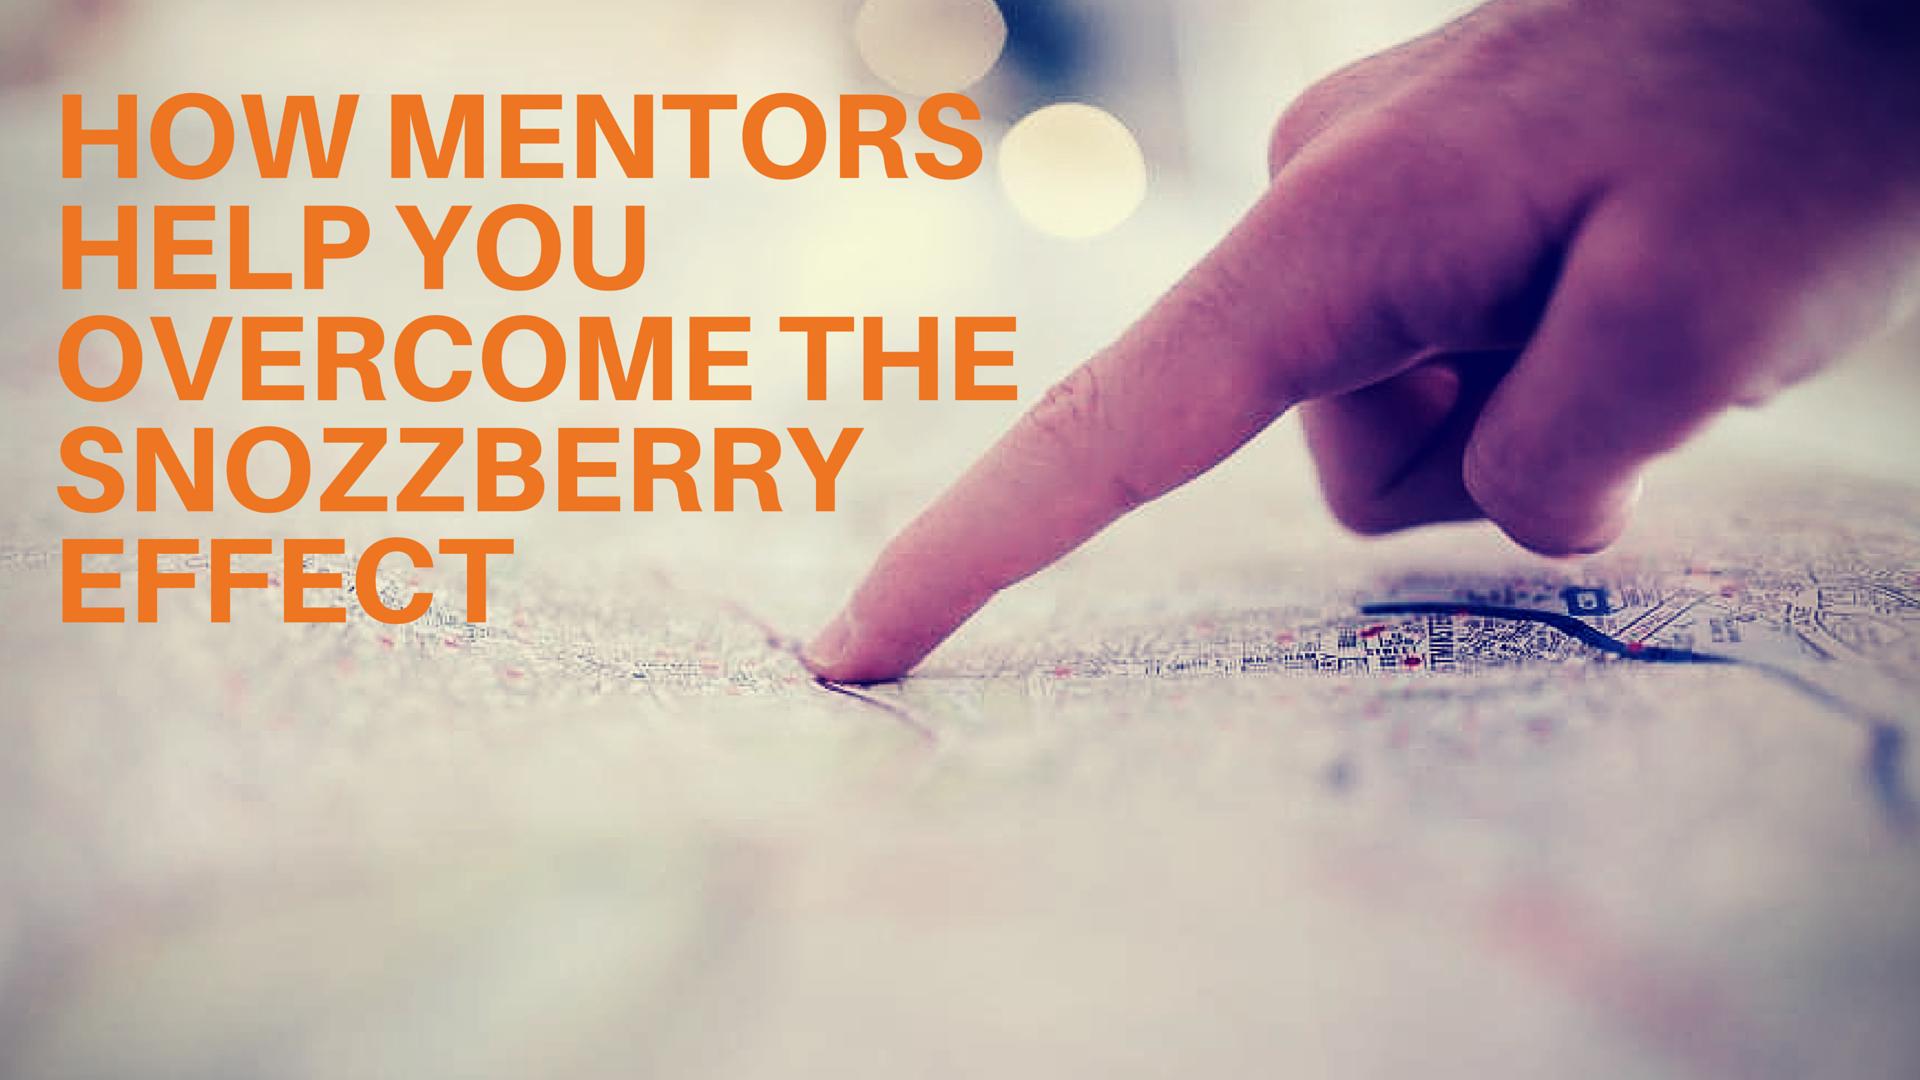 CJ Casciotta - How To Overcome The Snozzberry Effect - EDGE Mentoring Guest Post